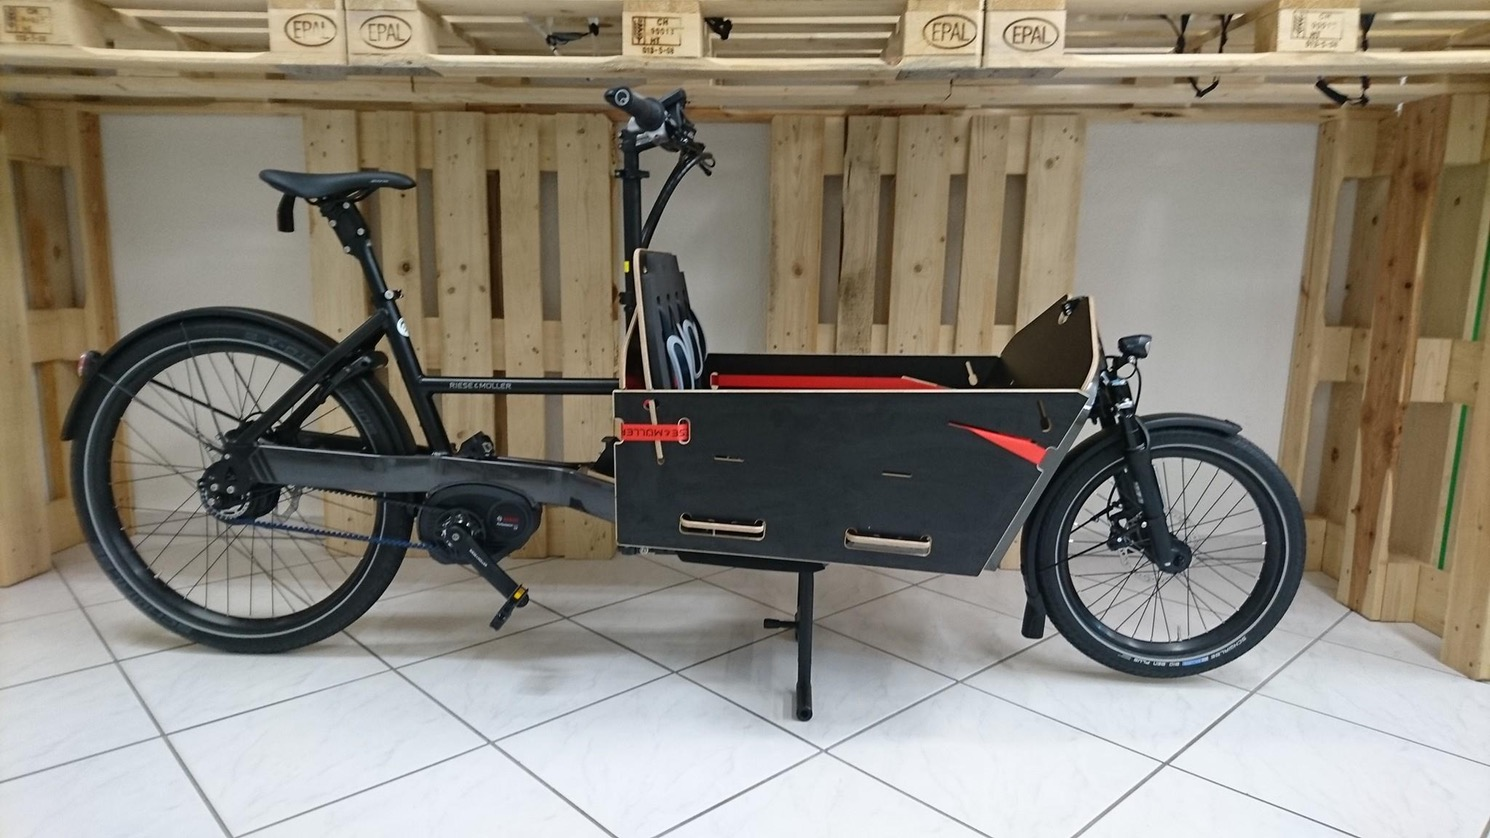 Riese und Müller e-Cargo / Lasten e-Bike Packster 2017